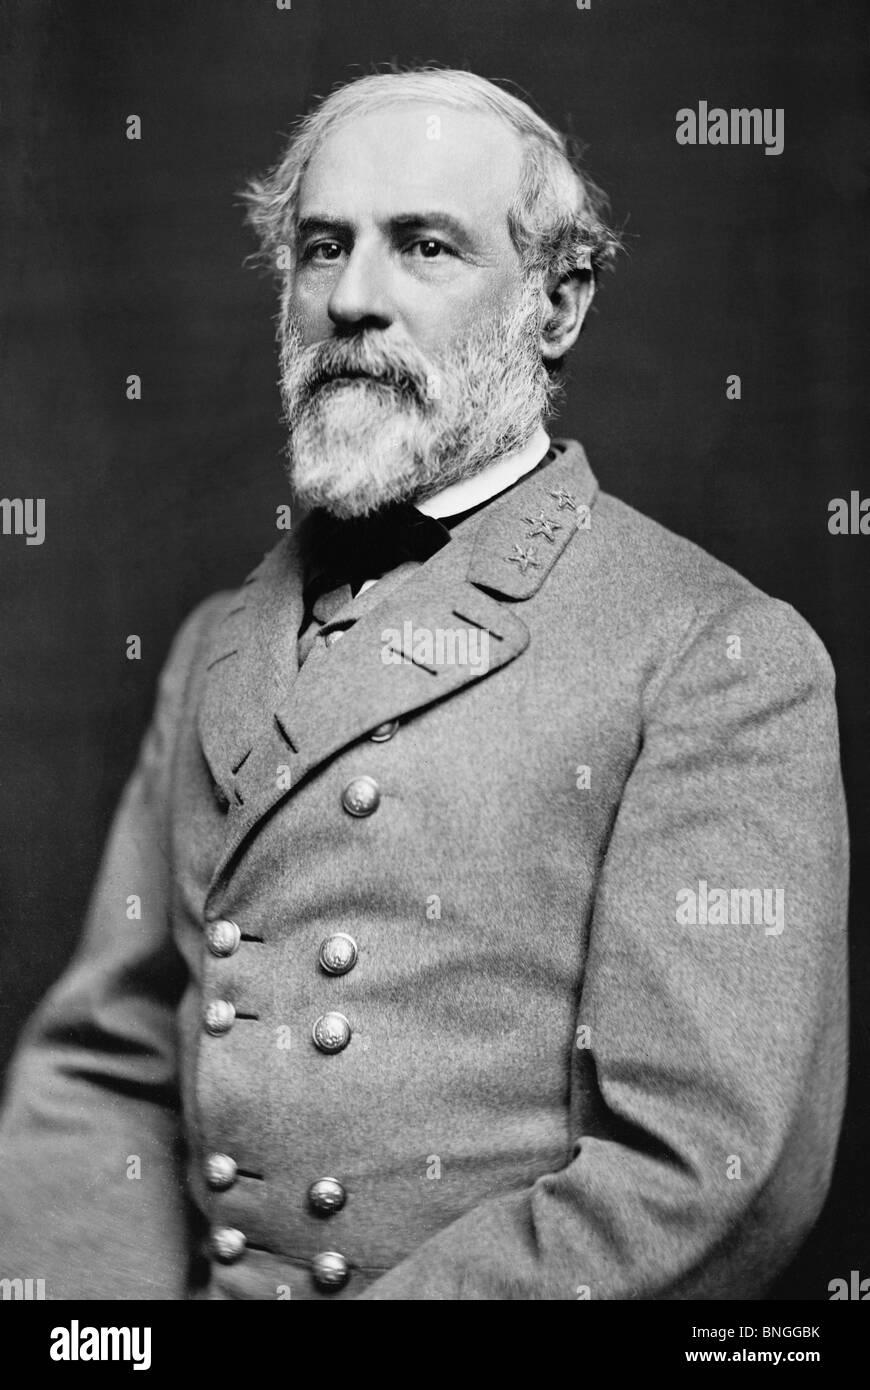 Foto retrato circa 1864 del general Robert E Lee (1807 - 1870) - iconic comandante confederado en la Guerra Civil Foto de stock